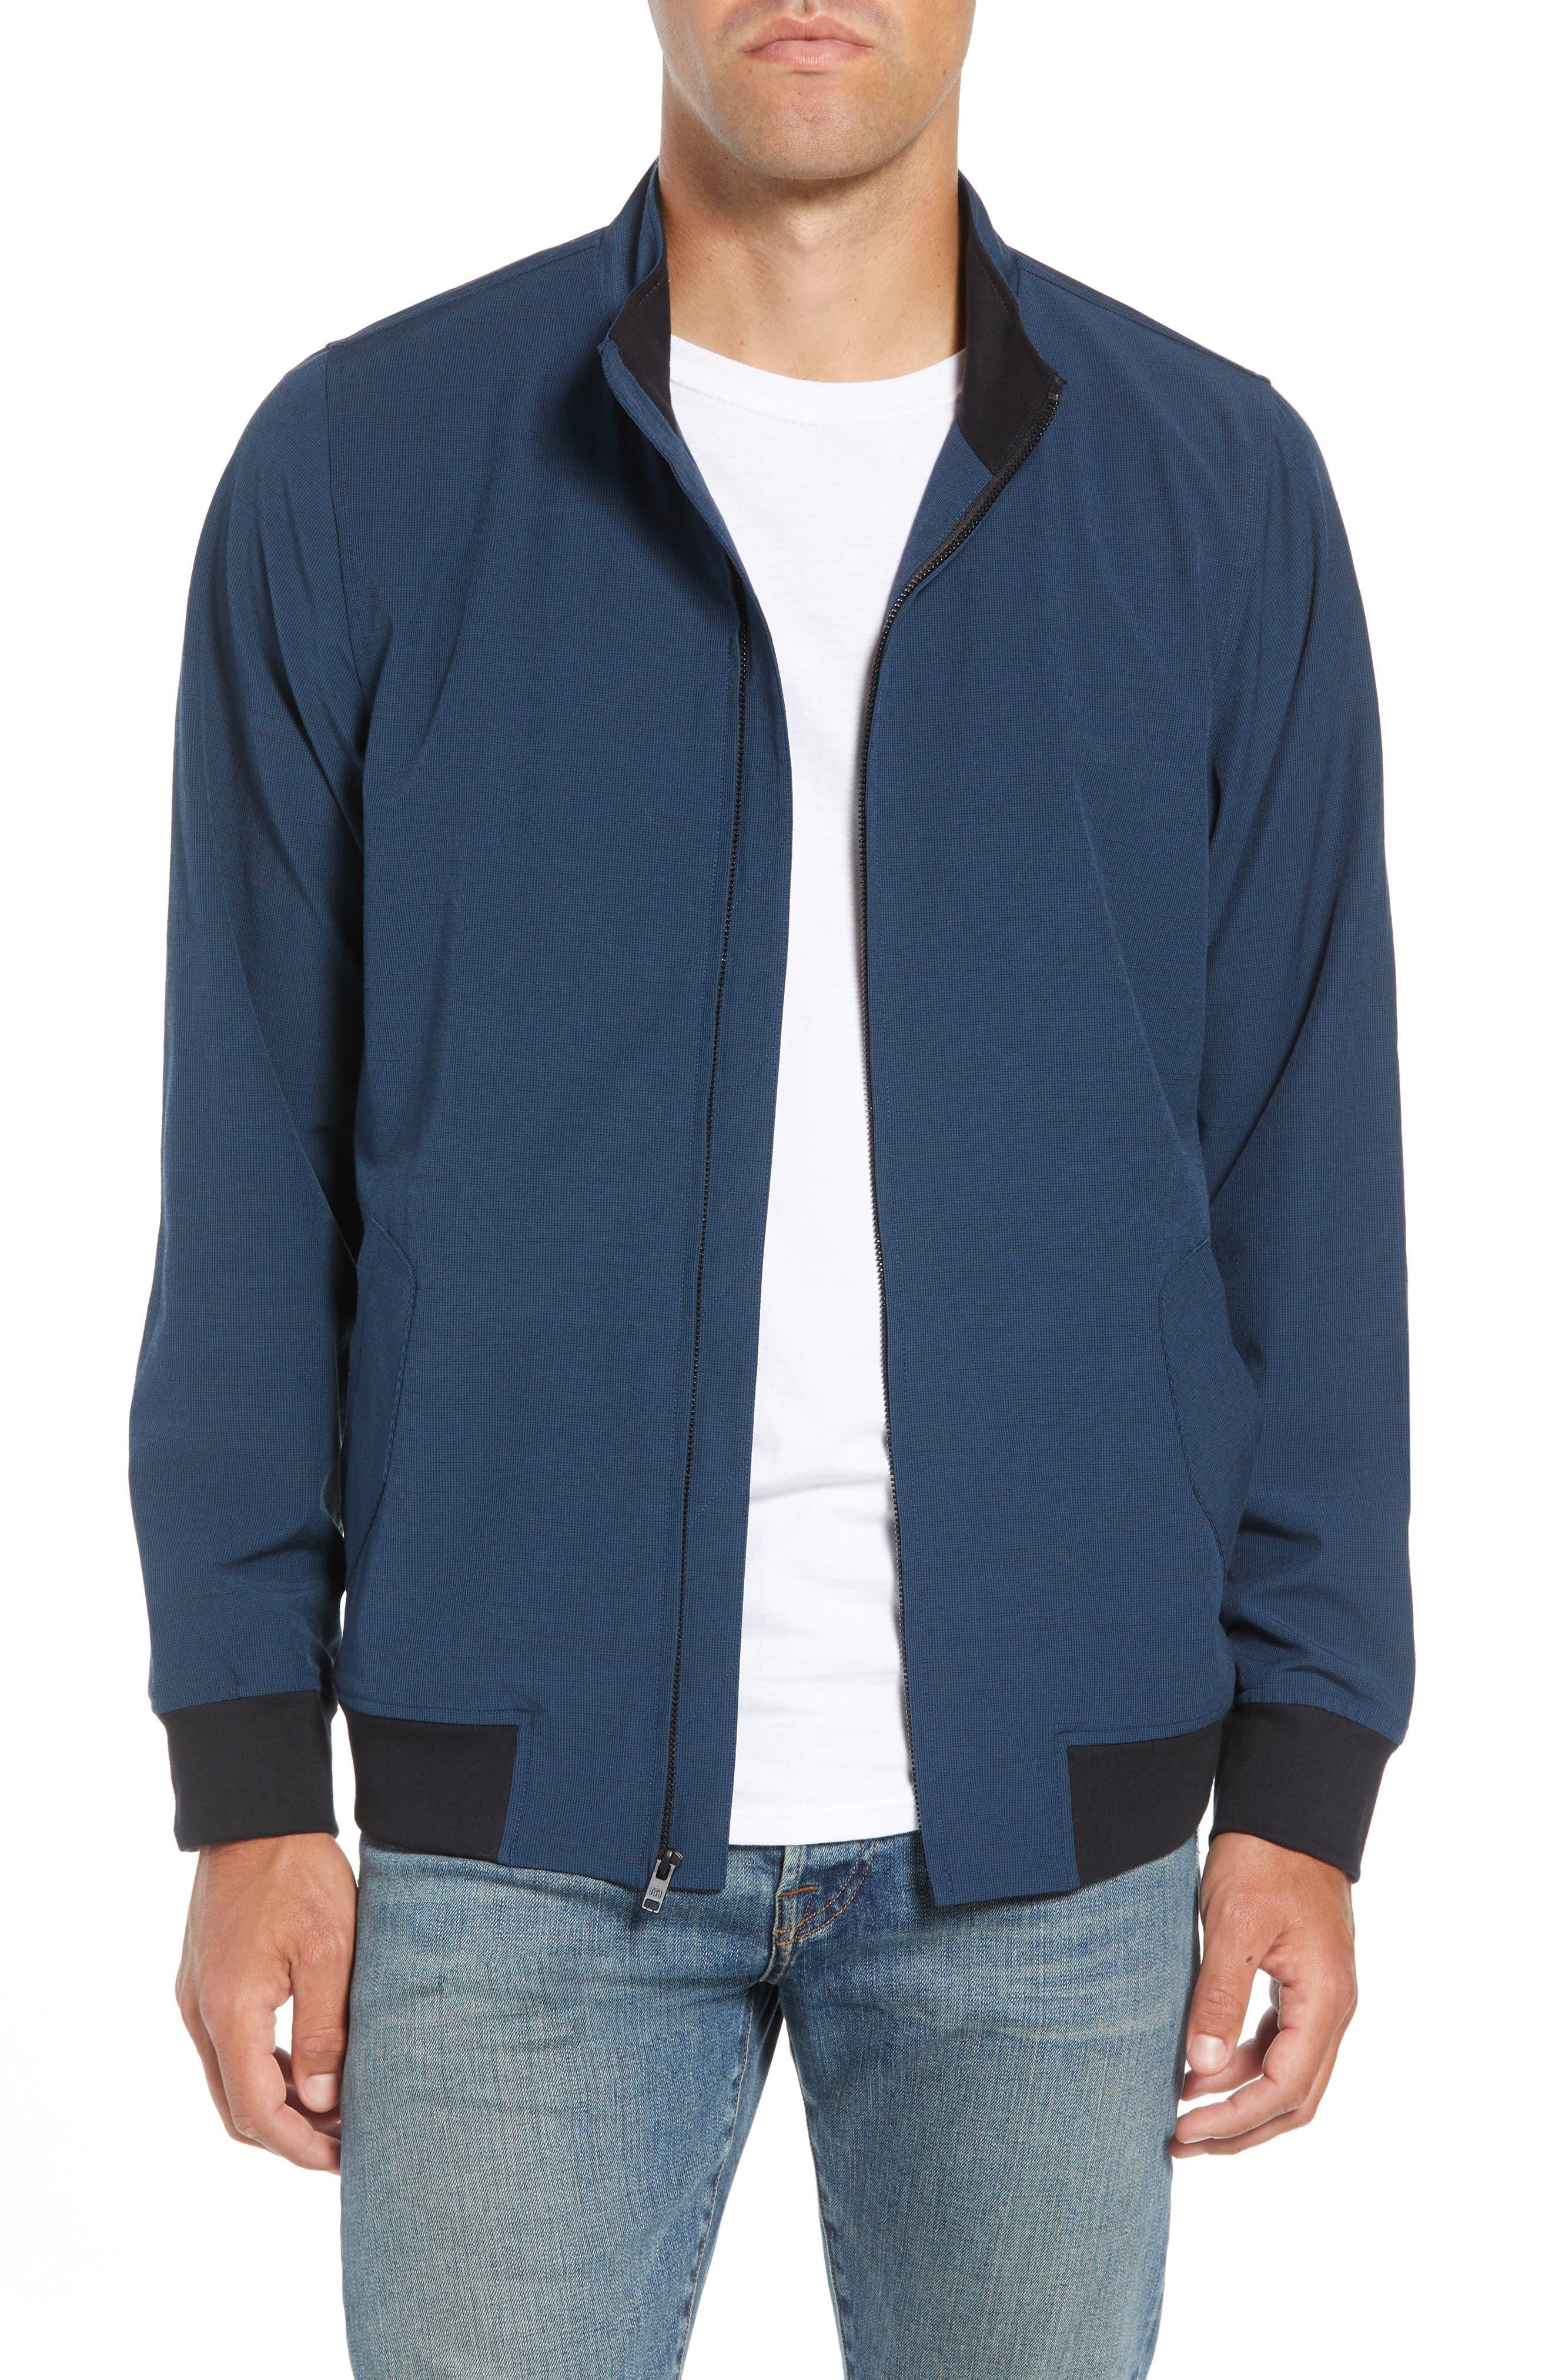 Ridgley Regular Fit Jacket,                             Main thumbnail 1, color,                             BLUE WING TEAL/ BLACK